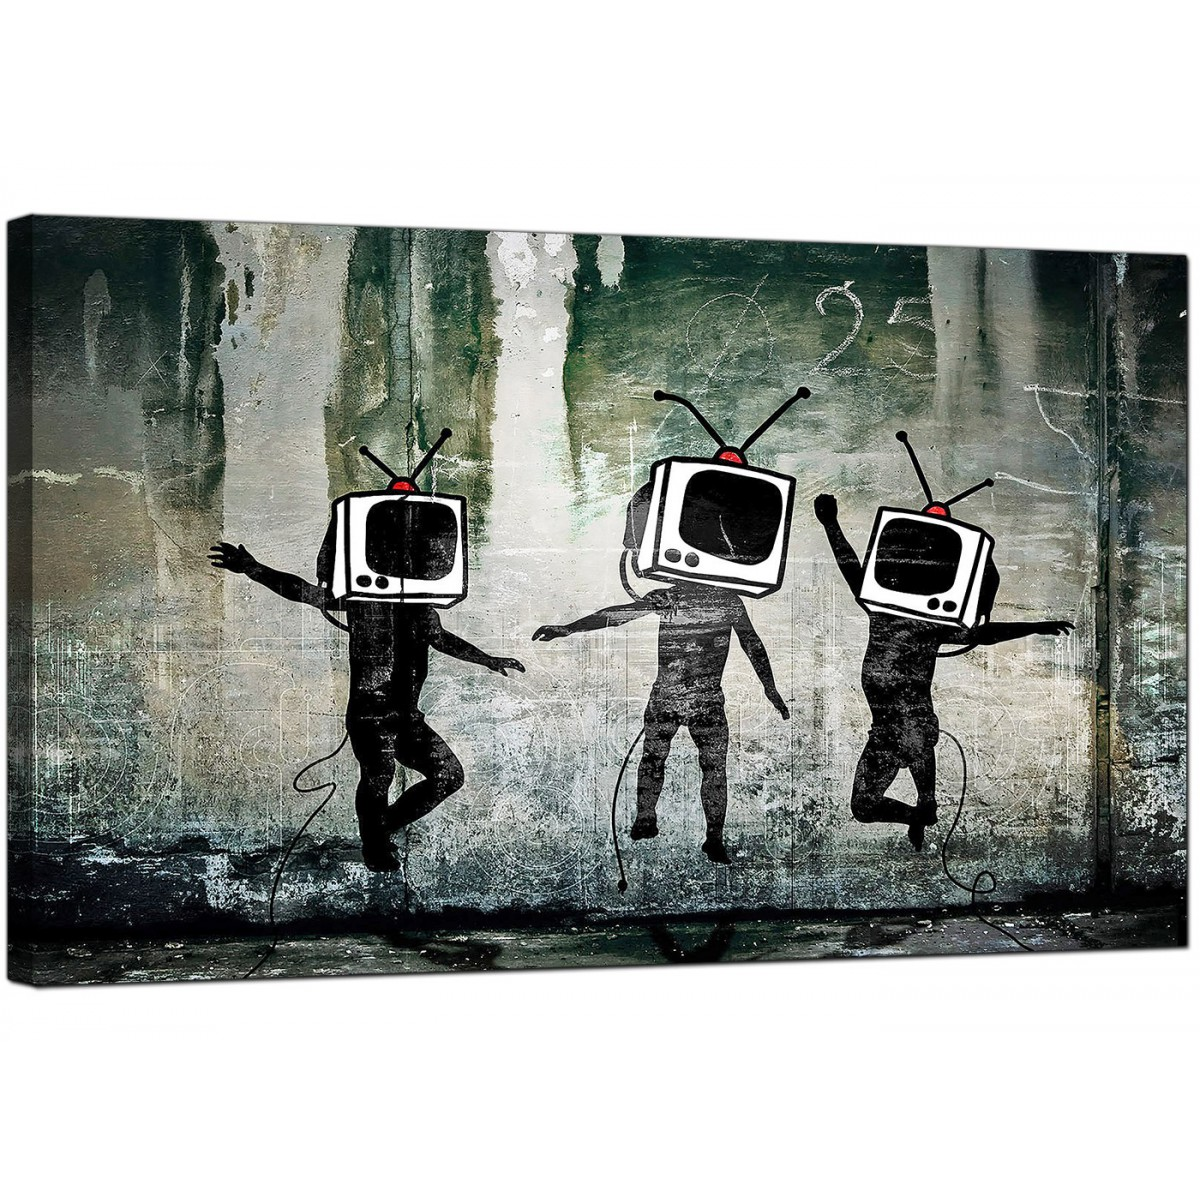 Banksy Canvas Prints Tv Heads